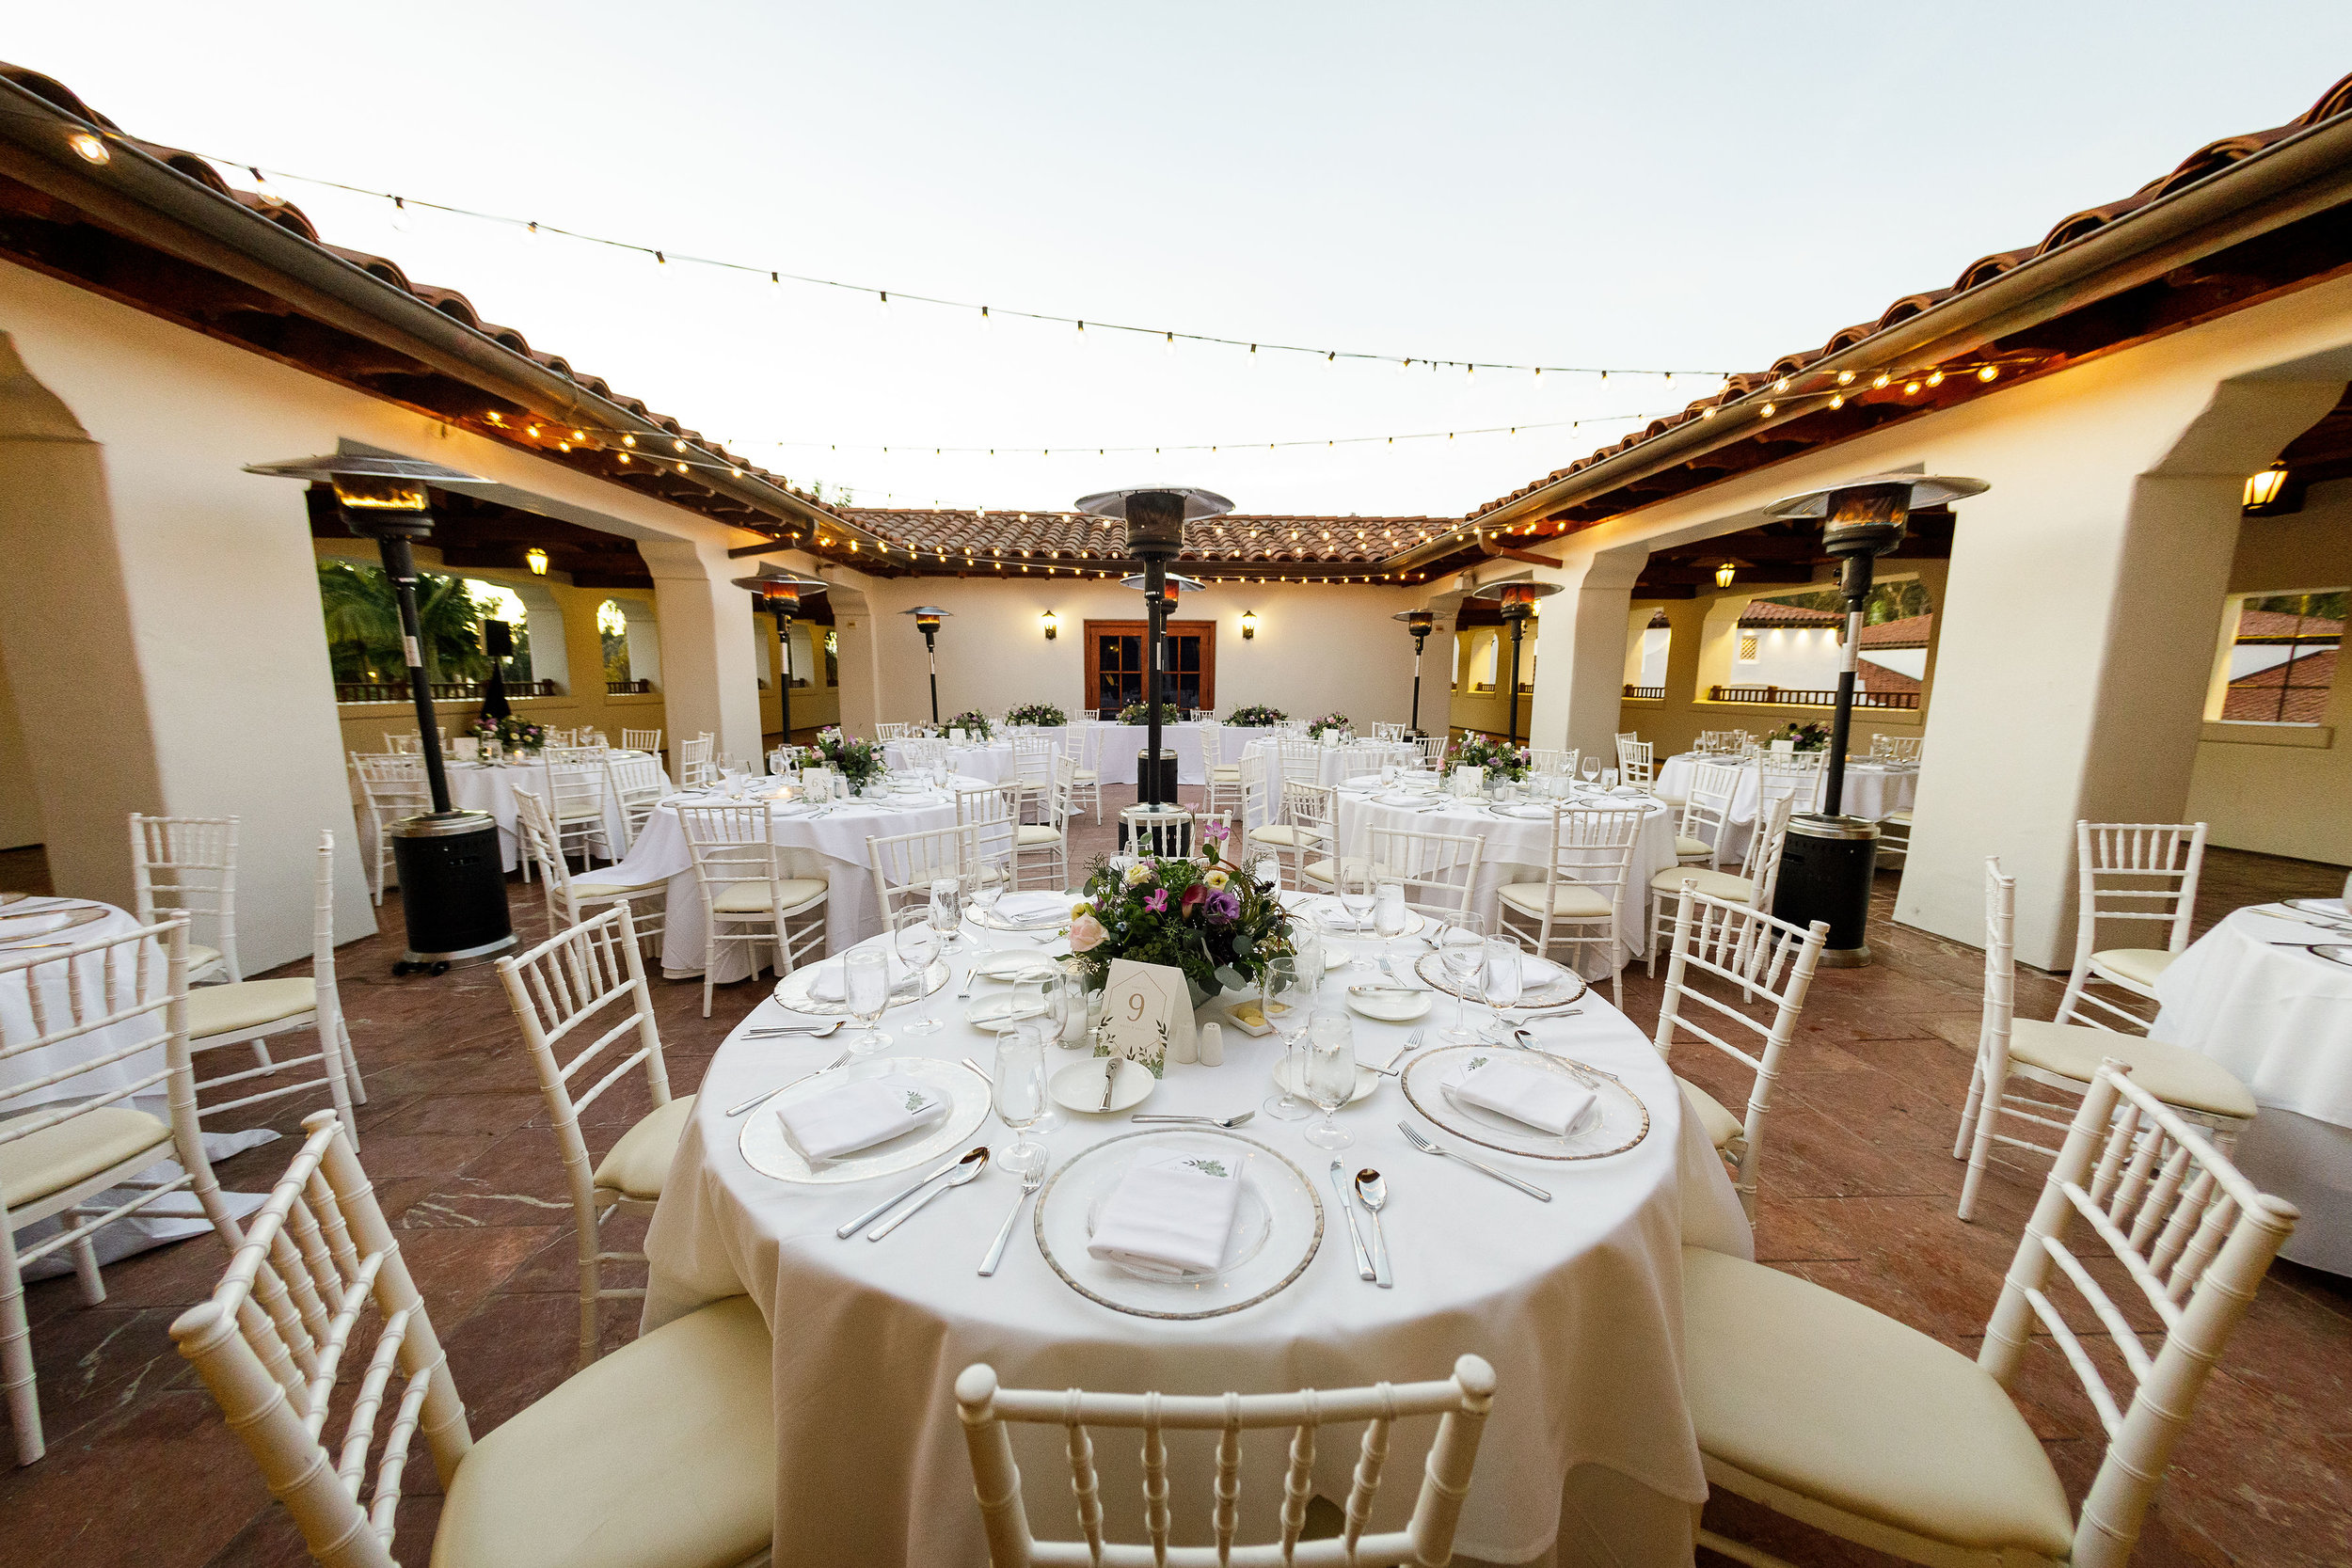 www.santabarbarawedding.com   Kiel Rucker Photography   The Ritz Carlton Bacara   Event of the Season   Cody Floral Design   Reception Tables Set Up